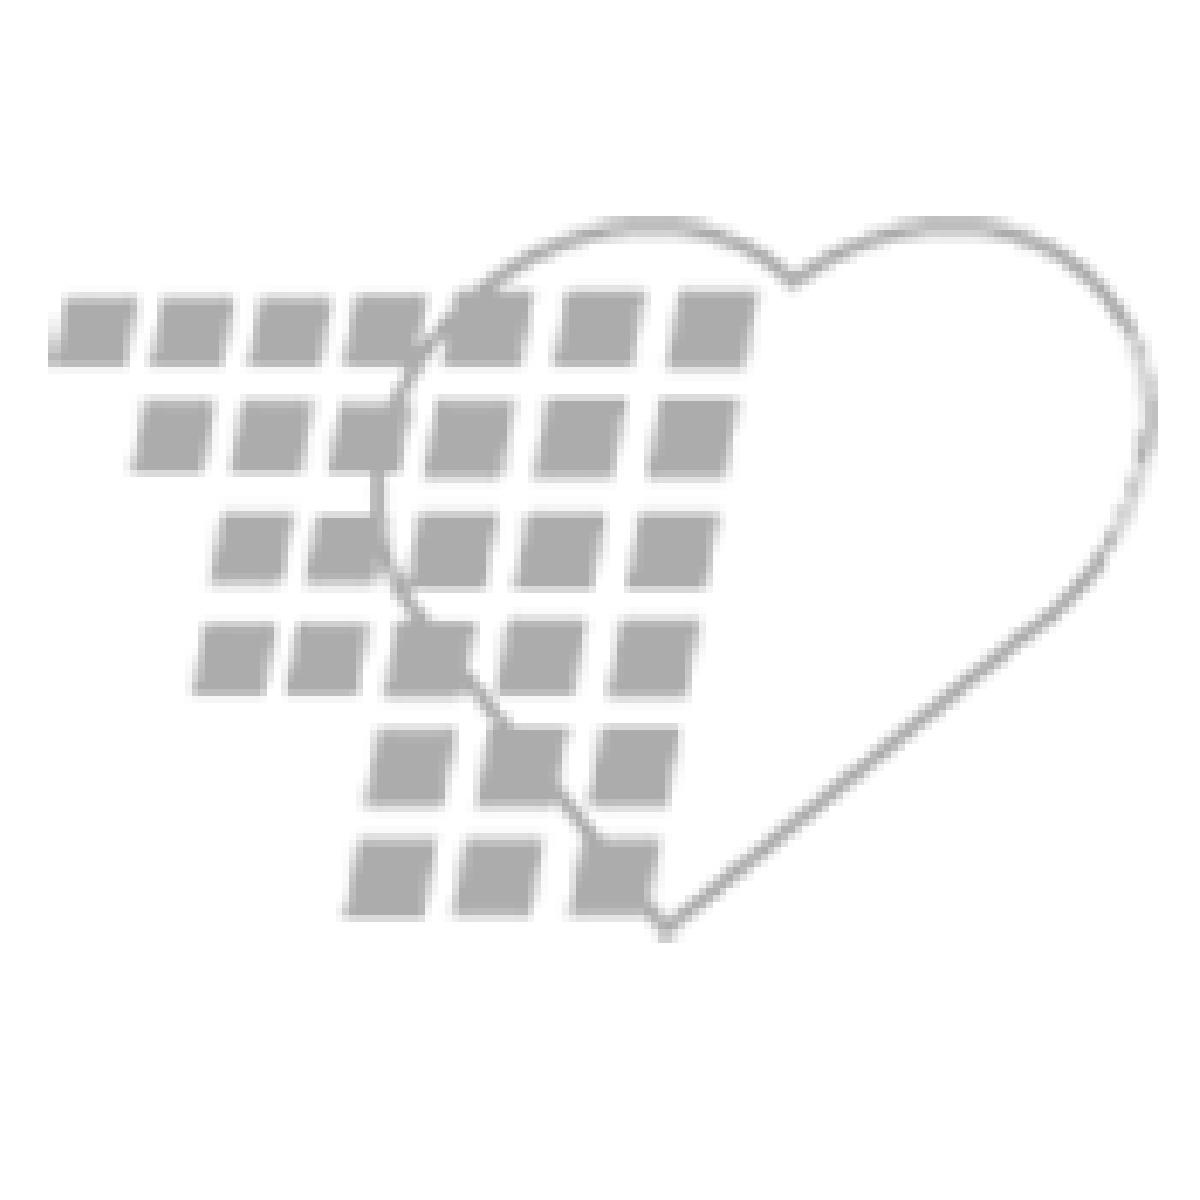 06-93-1706 Demo Dose® Scored Caplet, Pink -1000 Pills/Jar